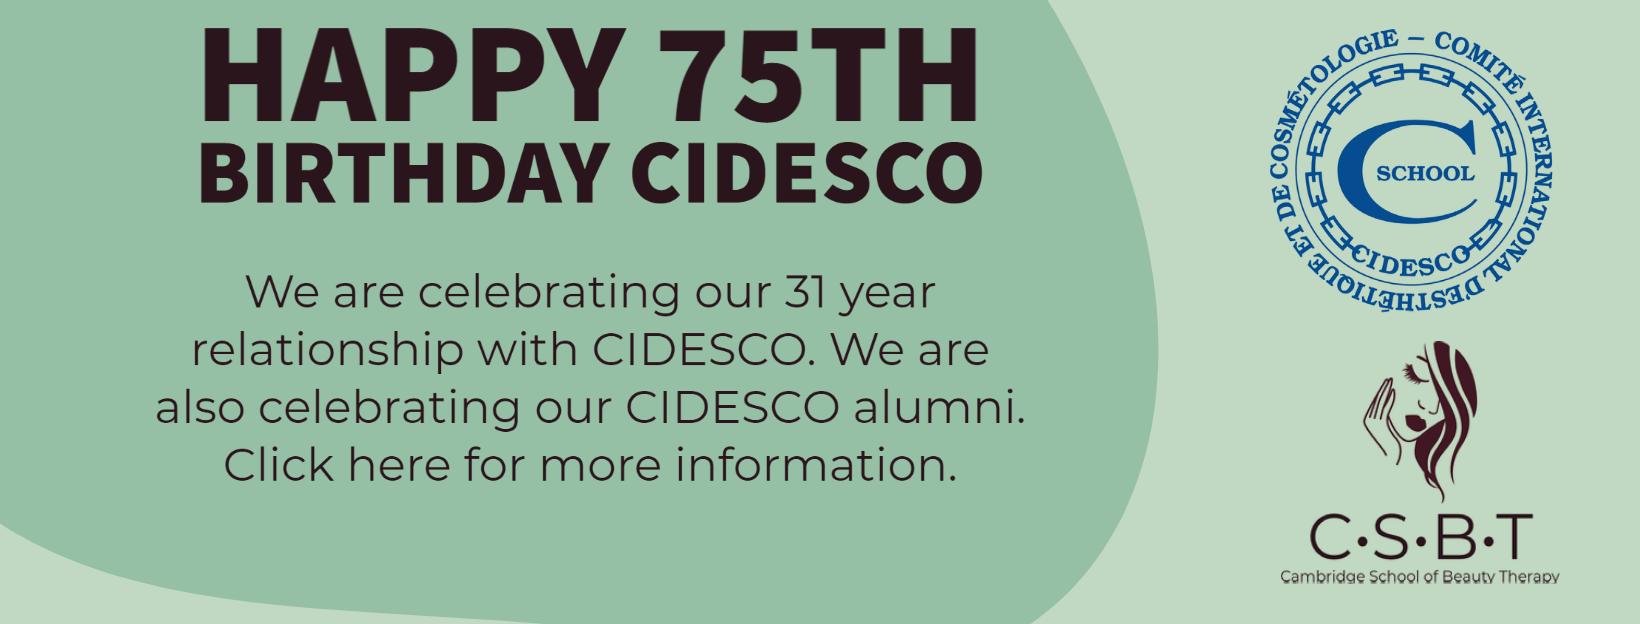 CIDESCO 75th Birthday